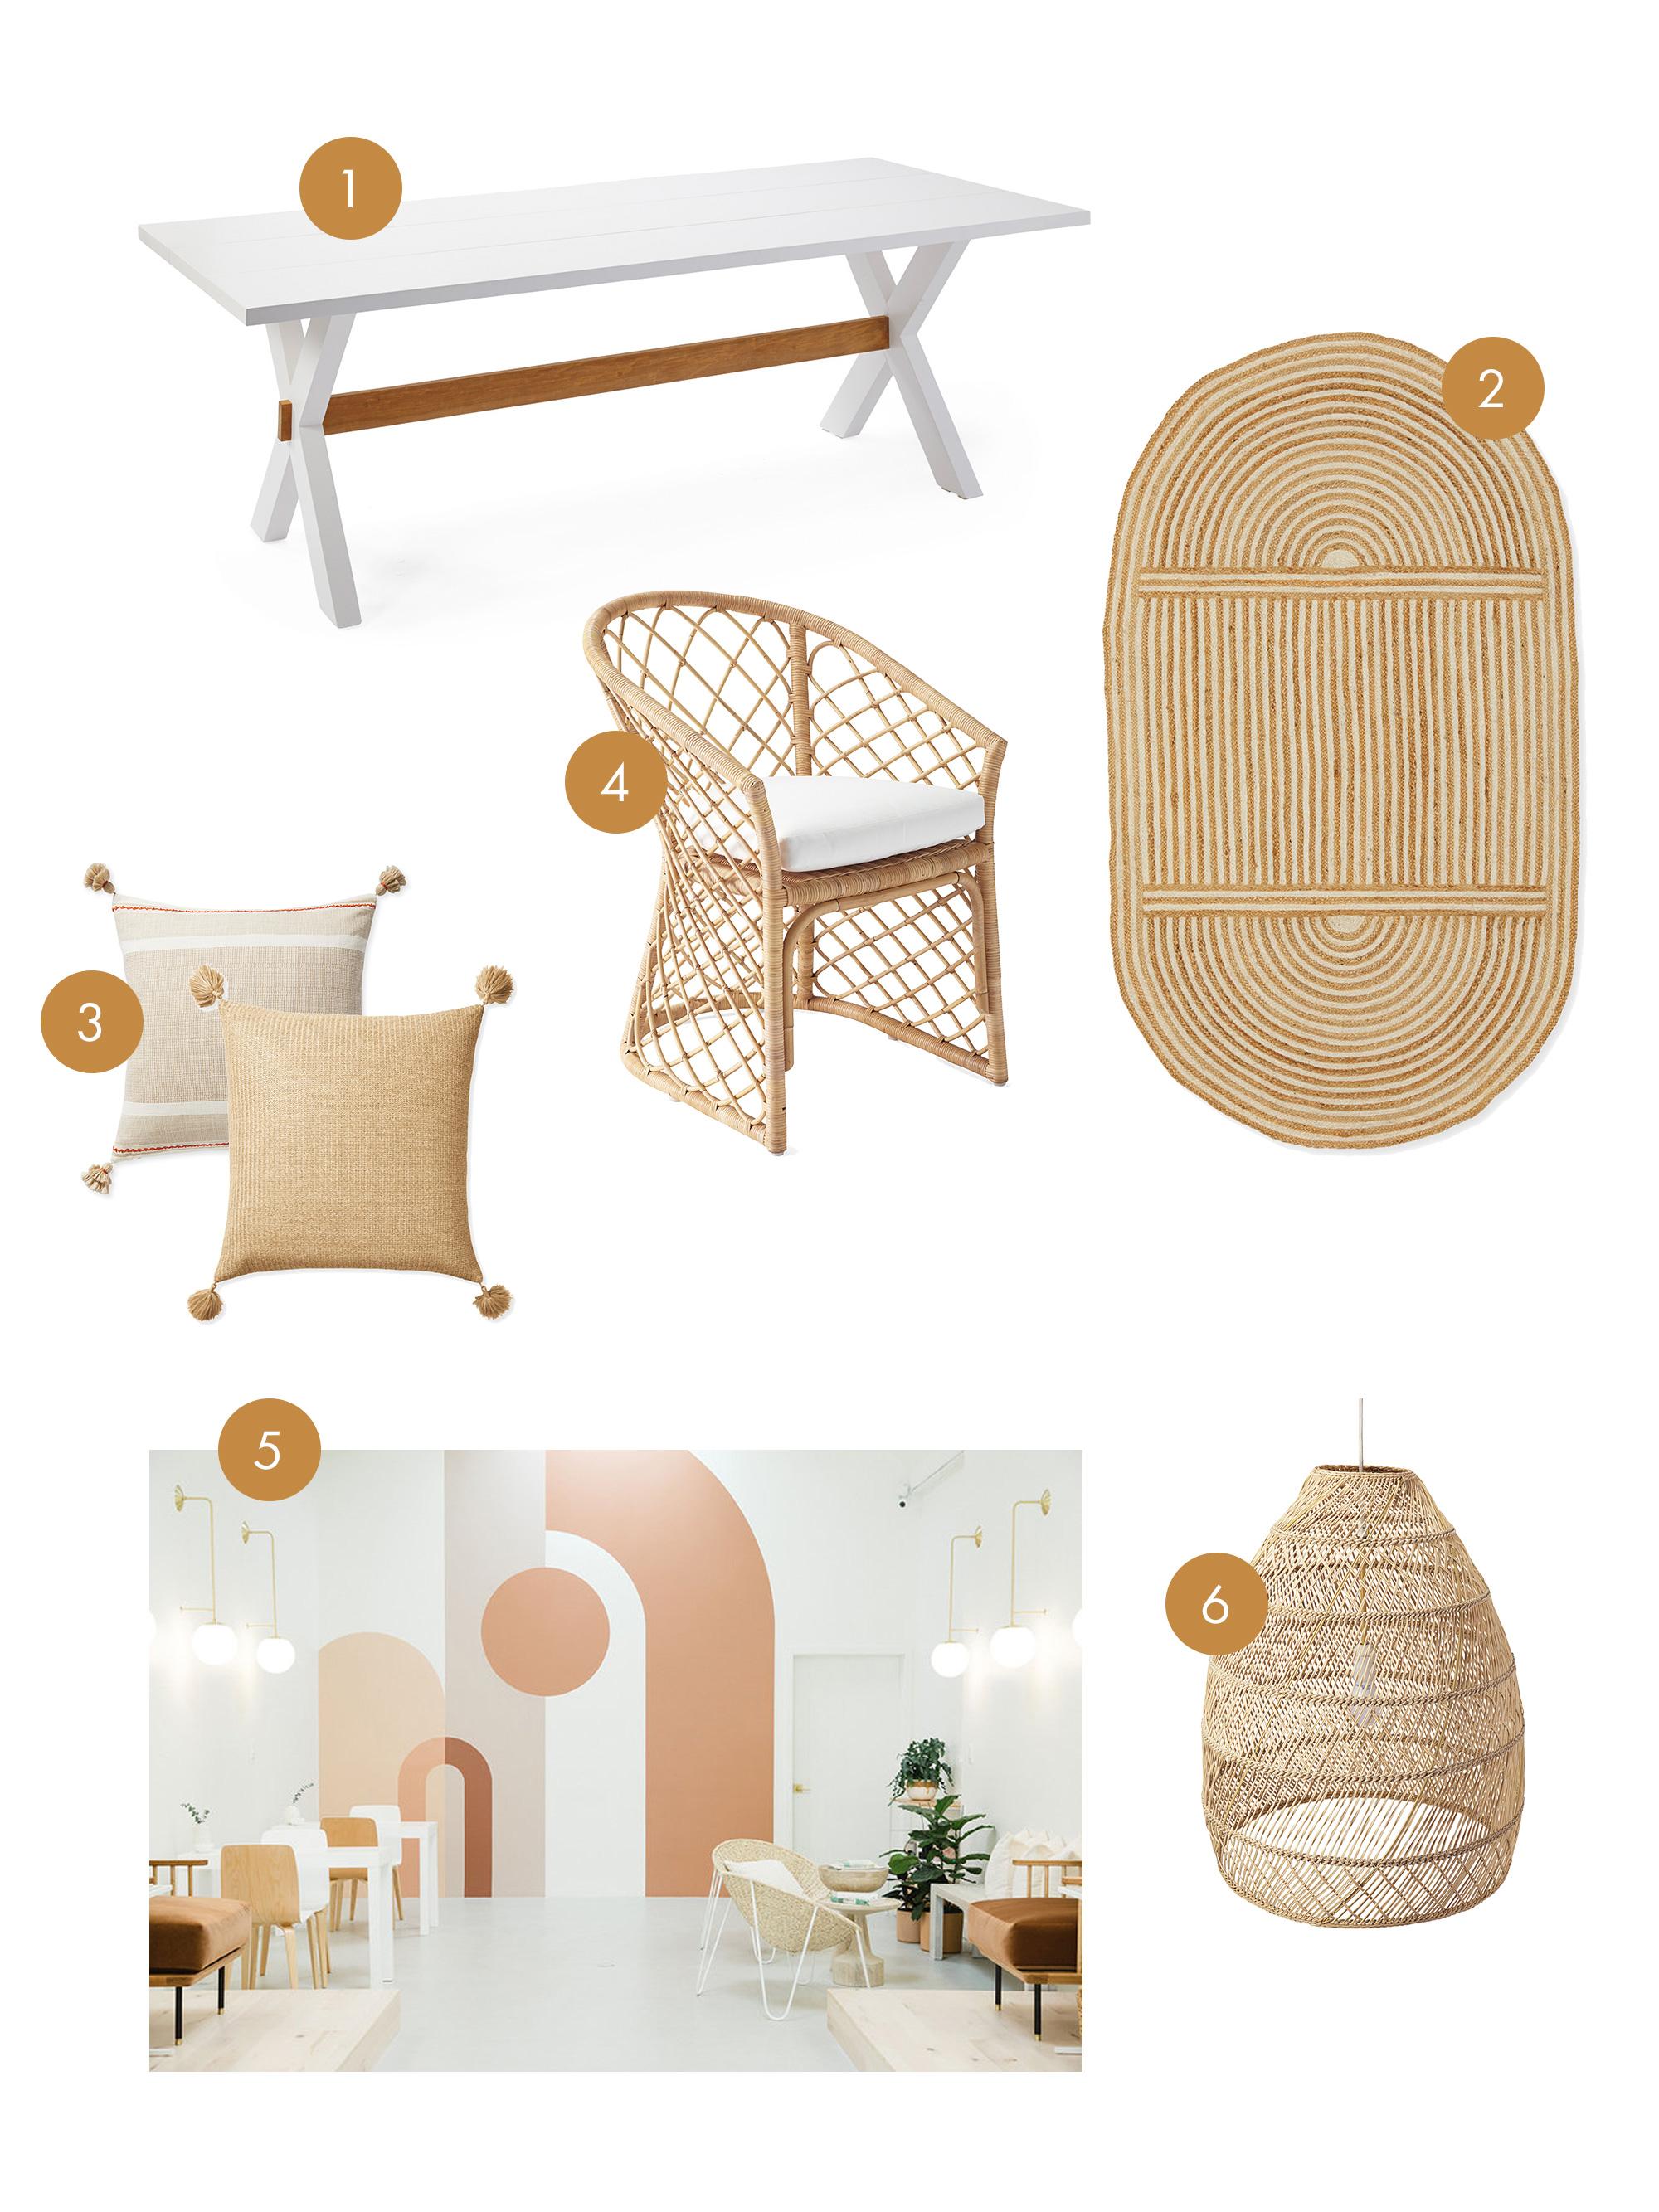 projectLanders-dining-room-moodboard-desert-home-decor.jpg